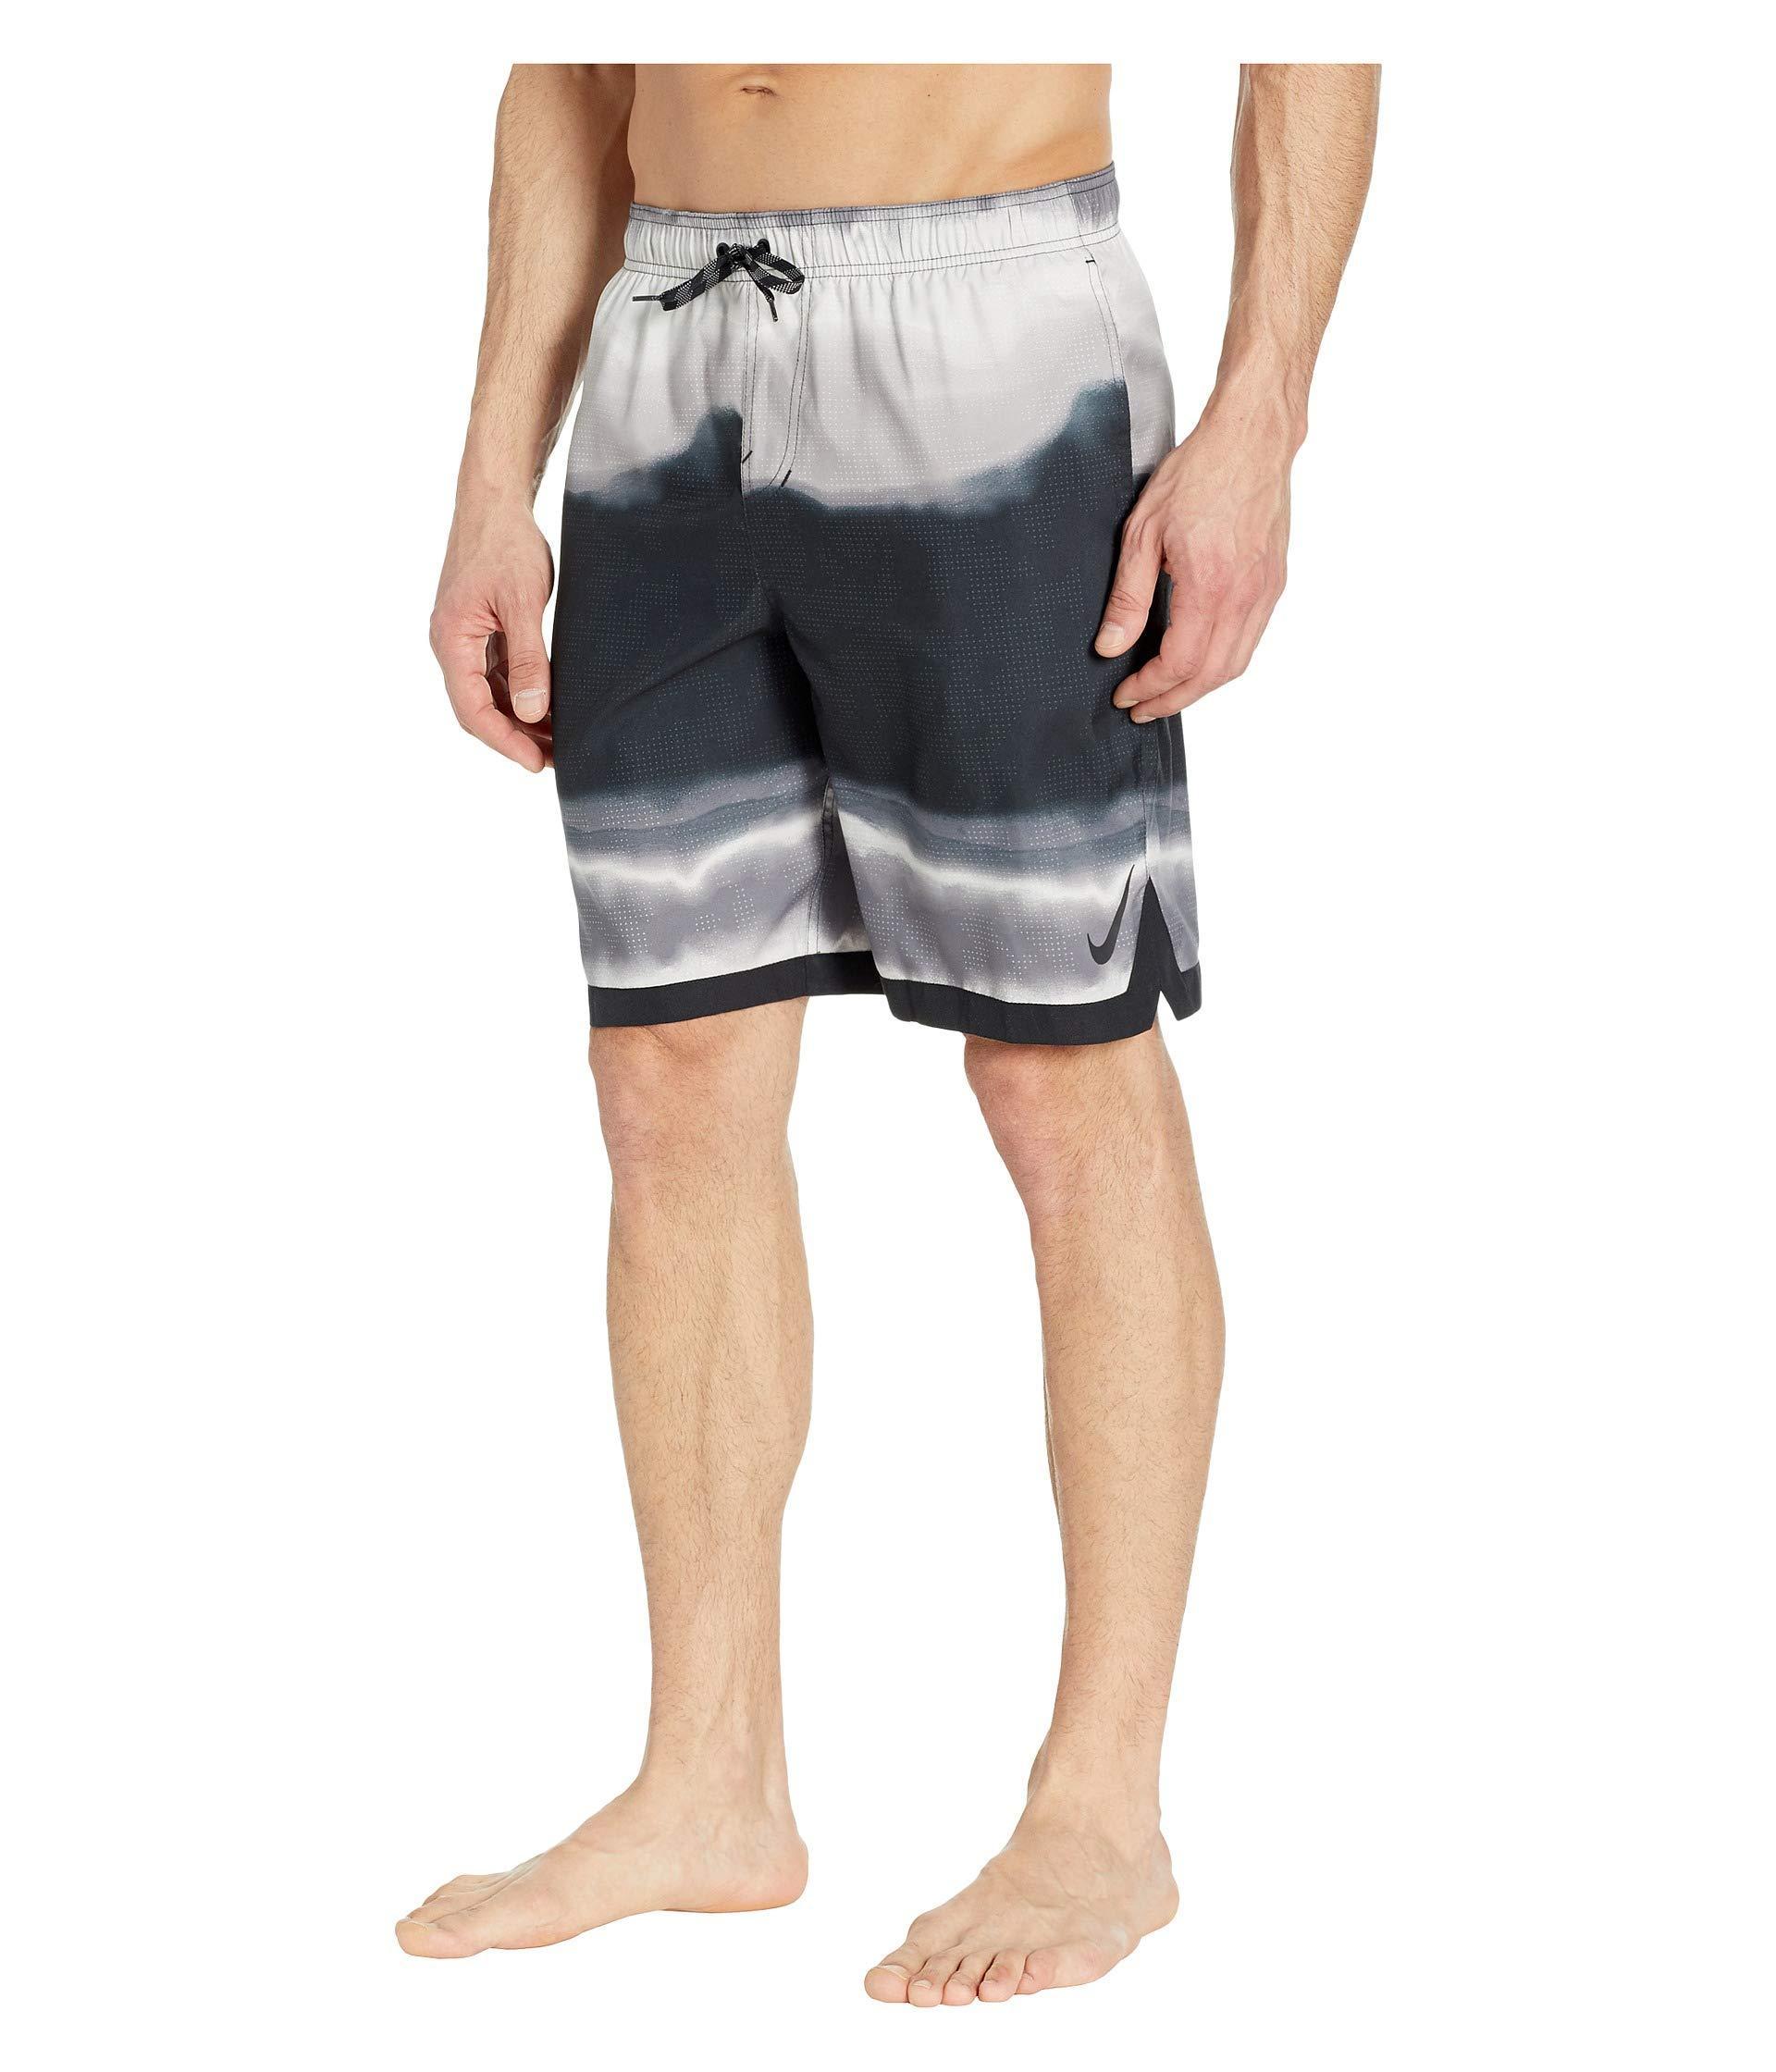 fee94595c77 Lyst - Nike 9 Optic Halo Horizon Volley Shorts (black) Men's Swimwear in  Black for Men